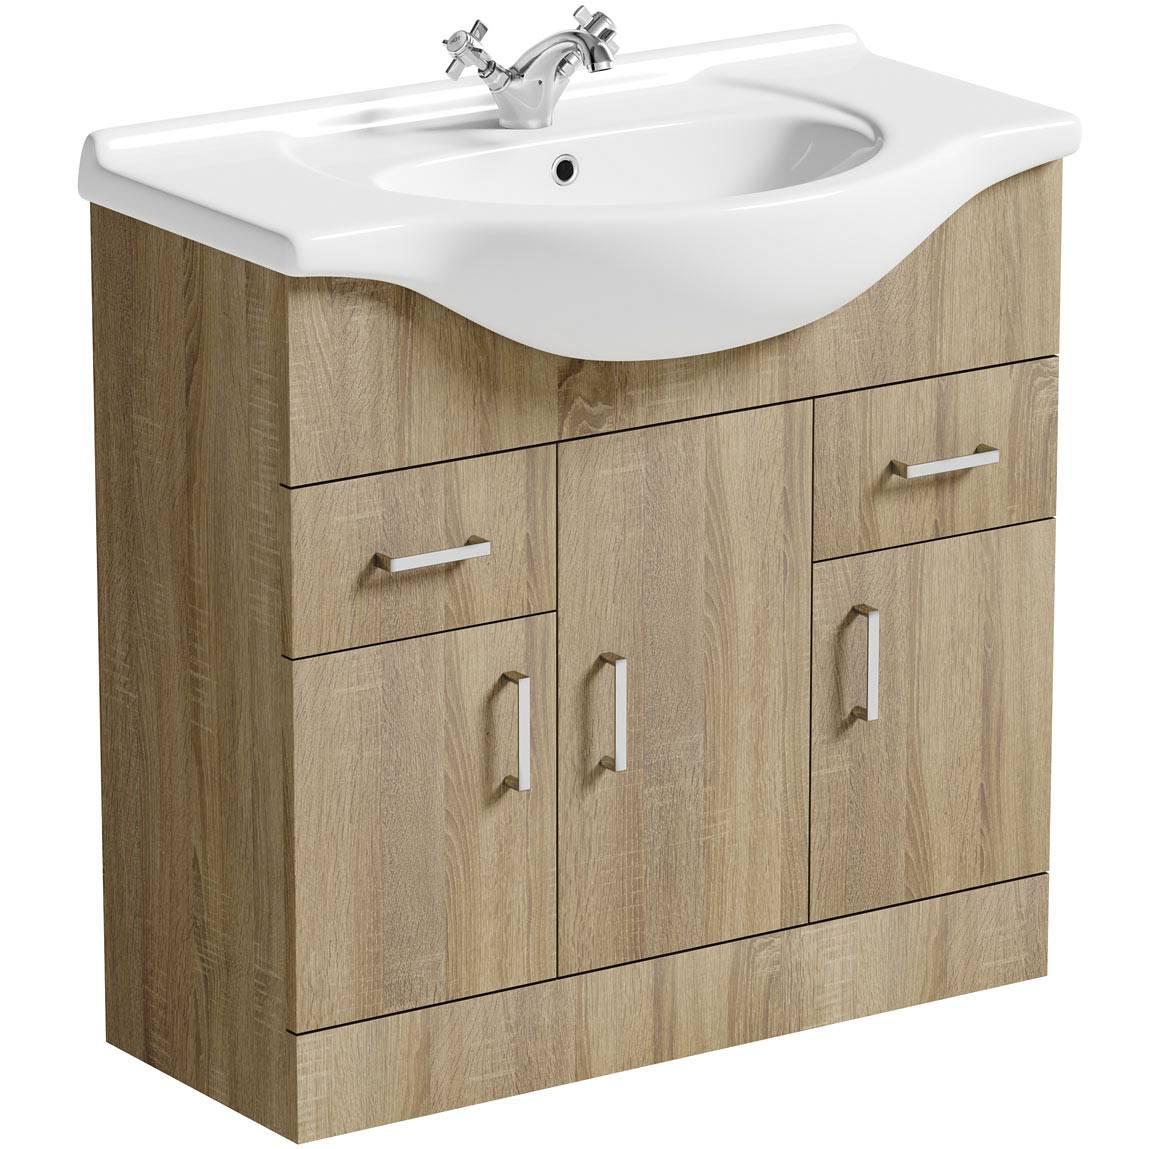 Image of Sienna Oak 85 Vanity Unit & Basin